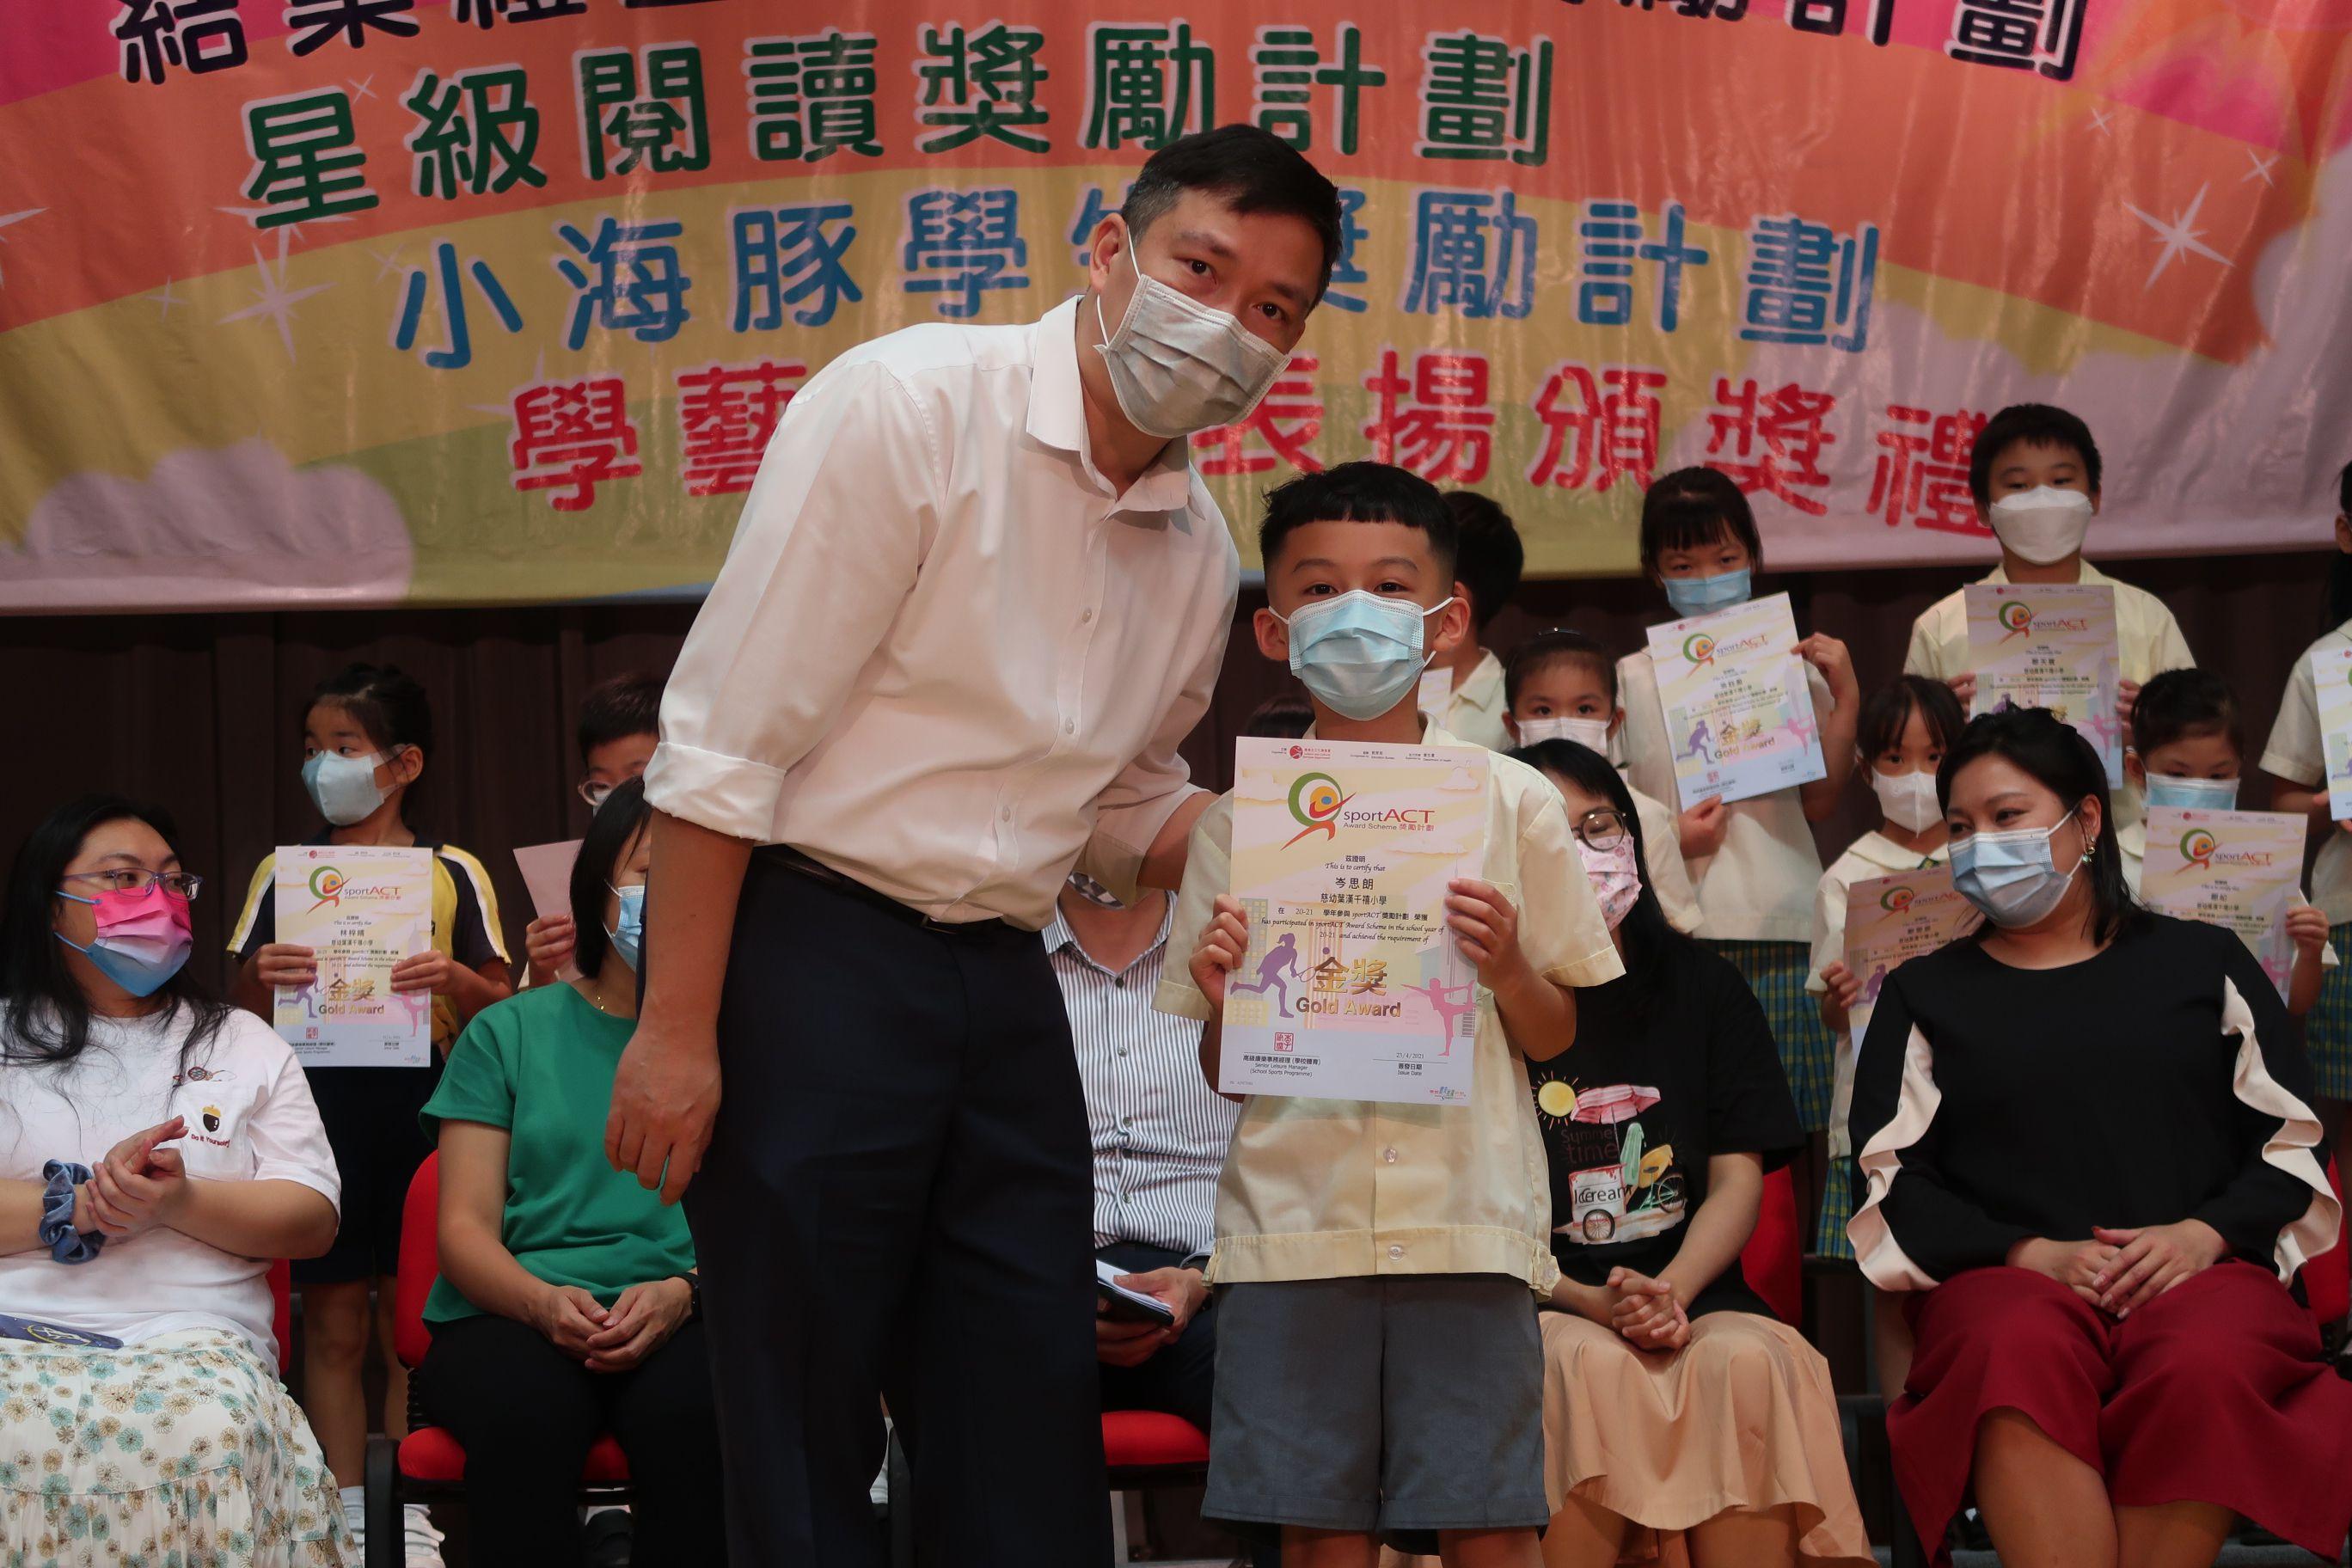 https://syh.edu.hk/sites/default/files/img_5908.jpg